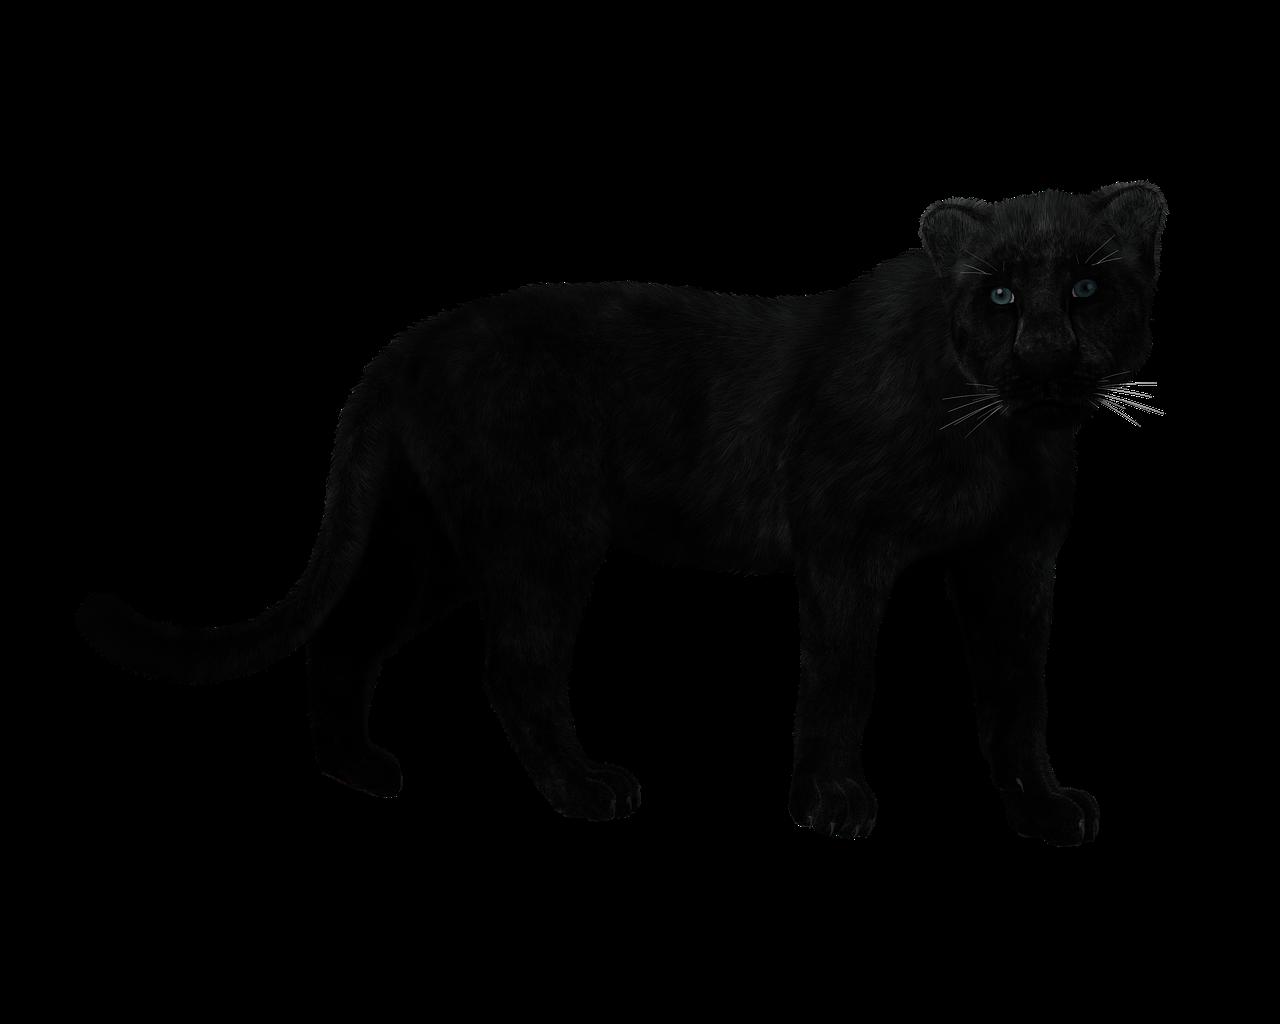 Panther Black Big Cat Mystical Free Image On Pixabay